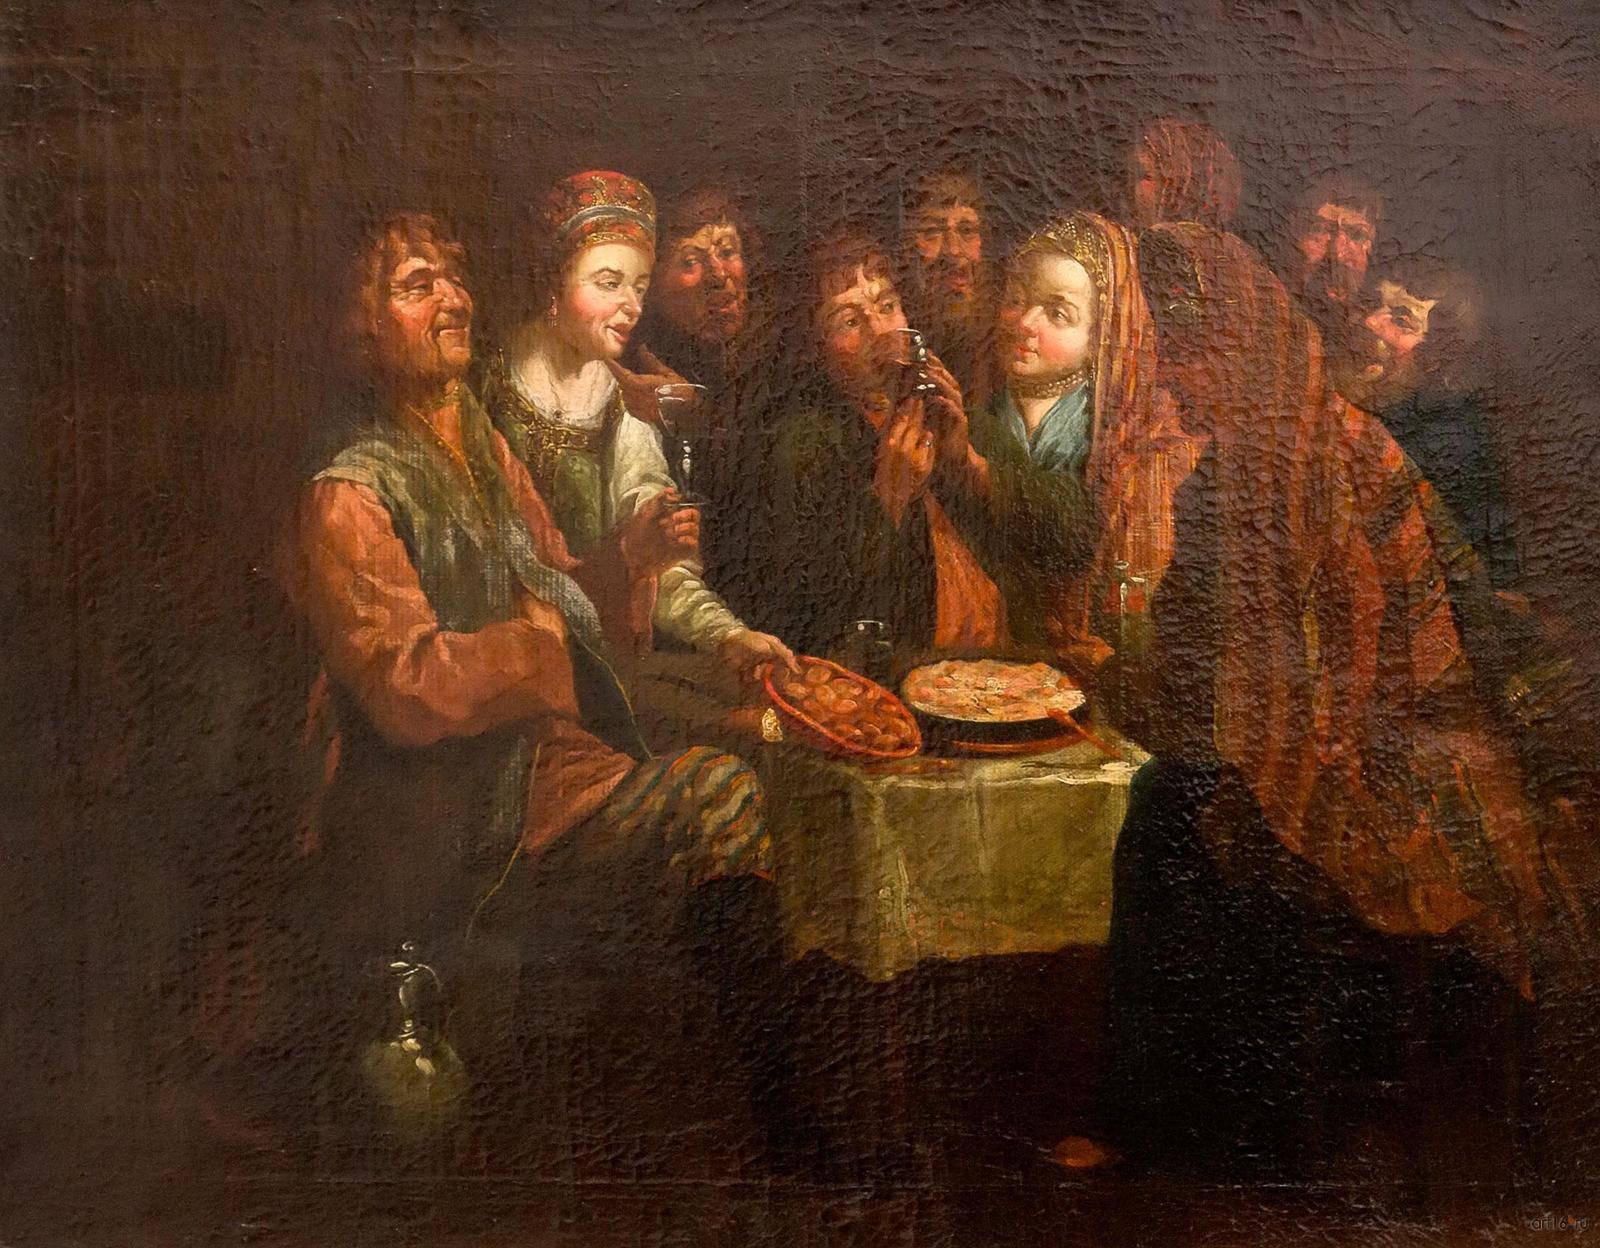 Фото №861175. Крестьянская пирушка. Конец. 1760-нач. 1770. Вишняков А.И., 1751